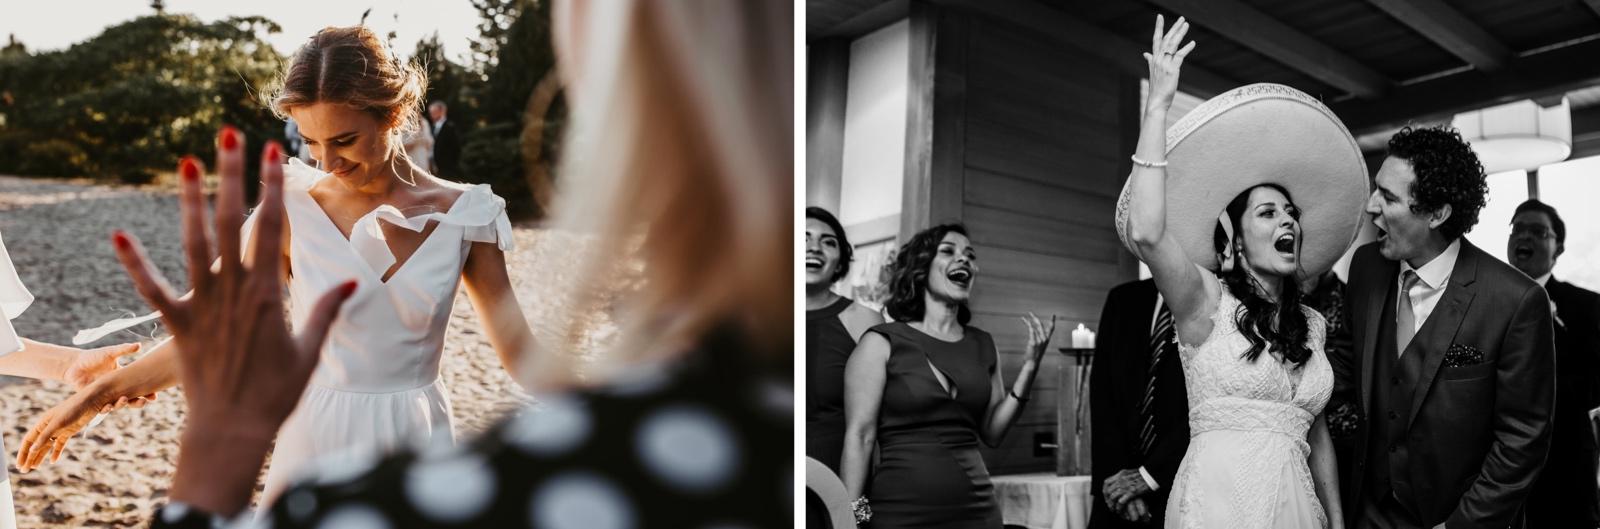 Fotomagoria Best 0f 2018 Wedding Photographer Italy47.jpg